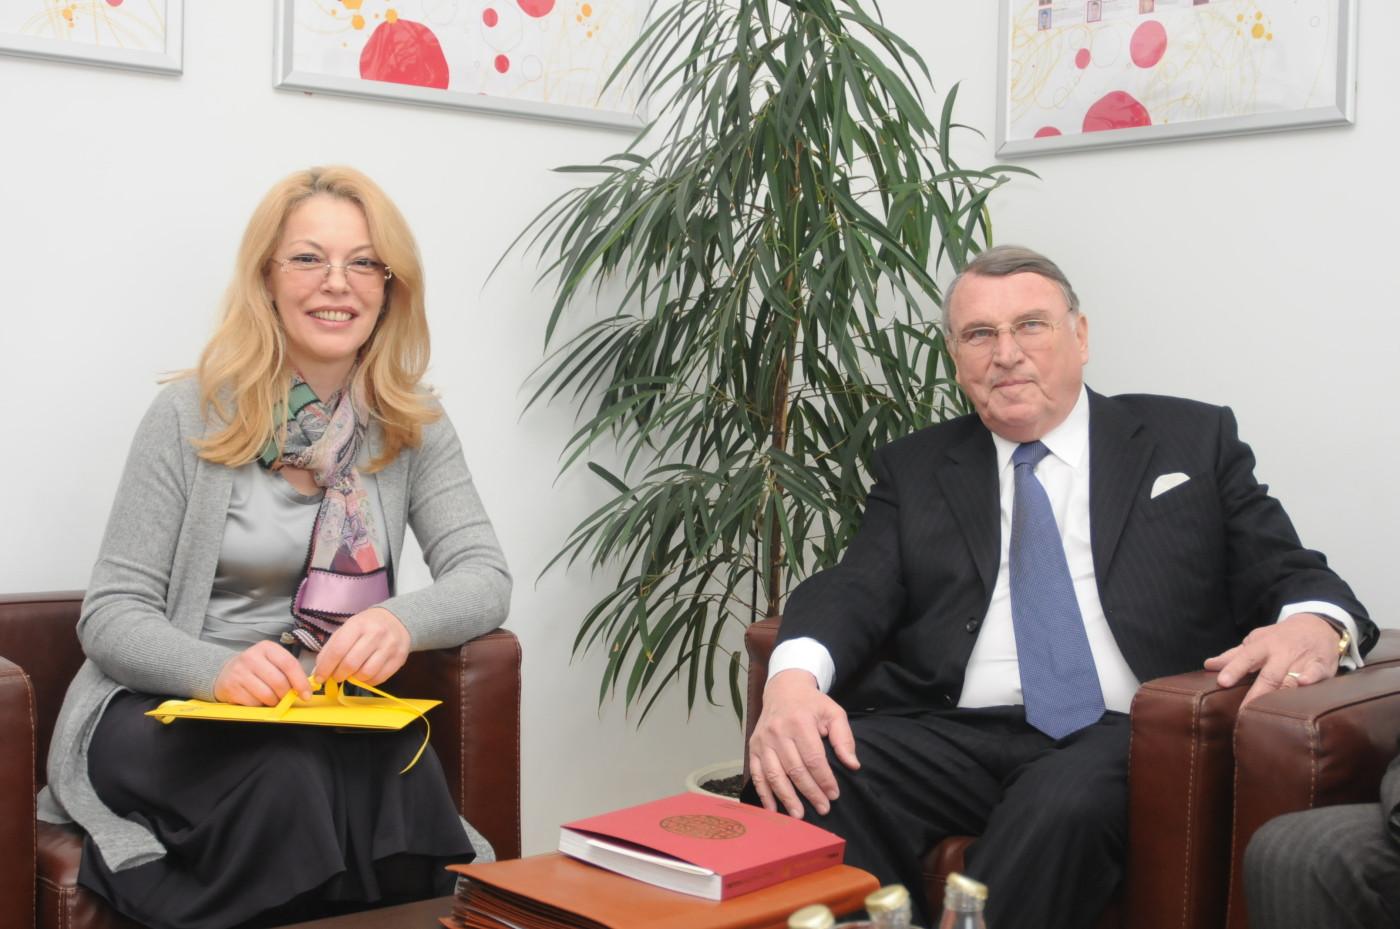 Ruzica Djindjic and Prof. Klaus Mangold